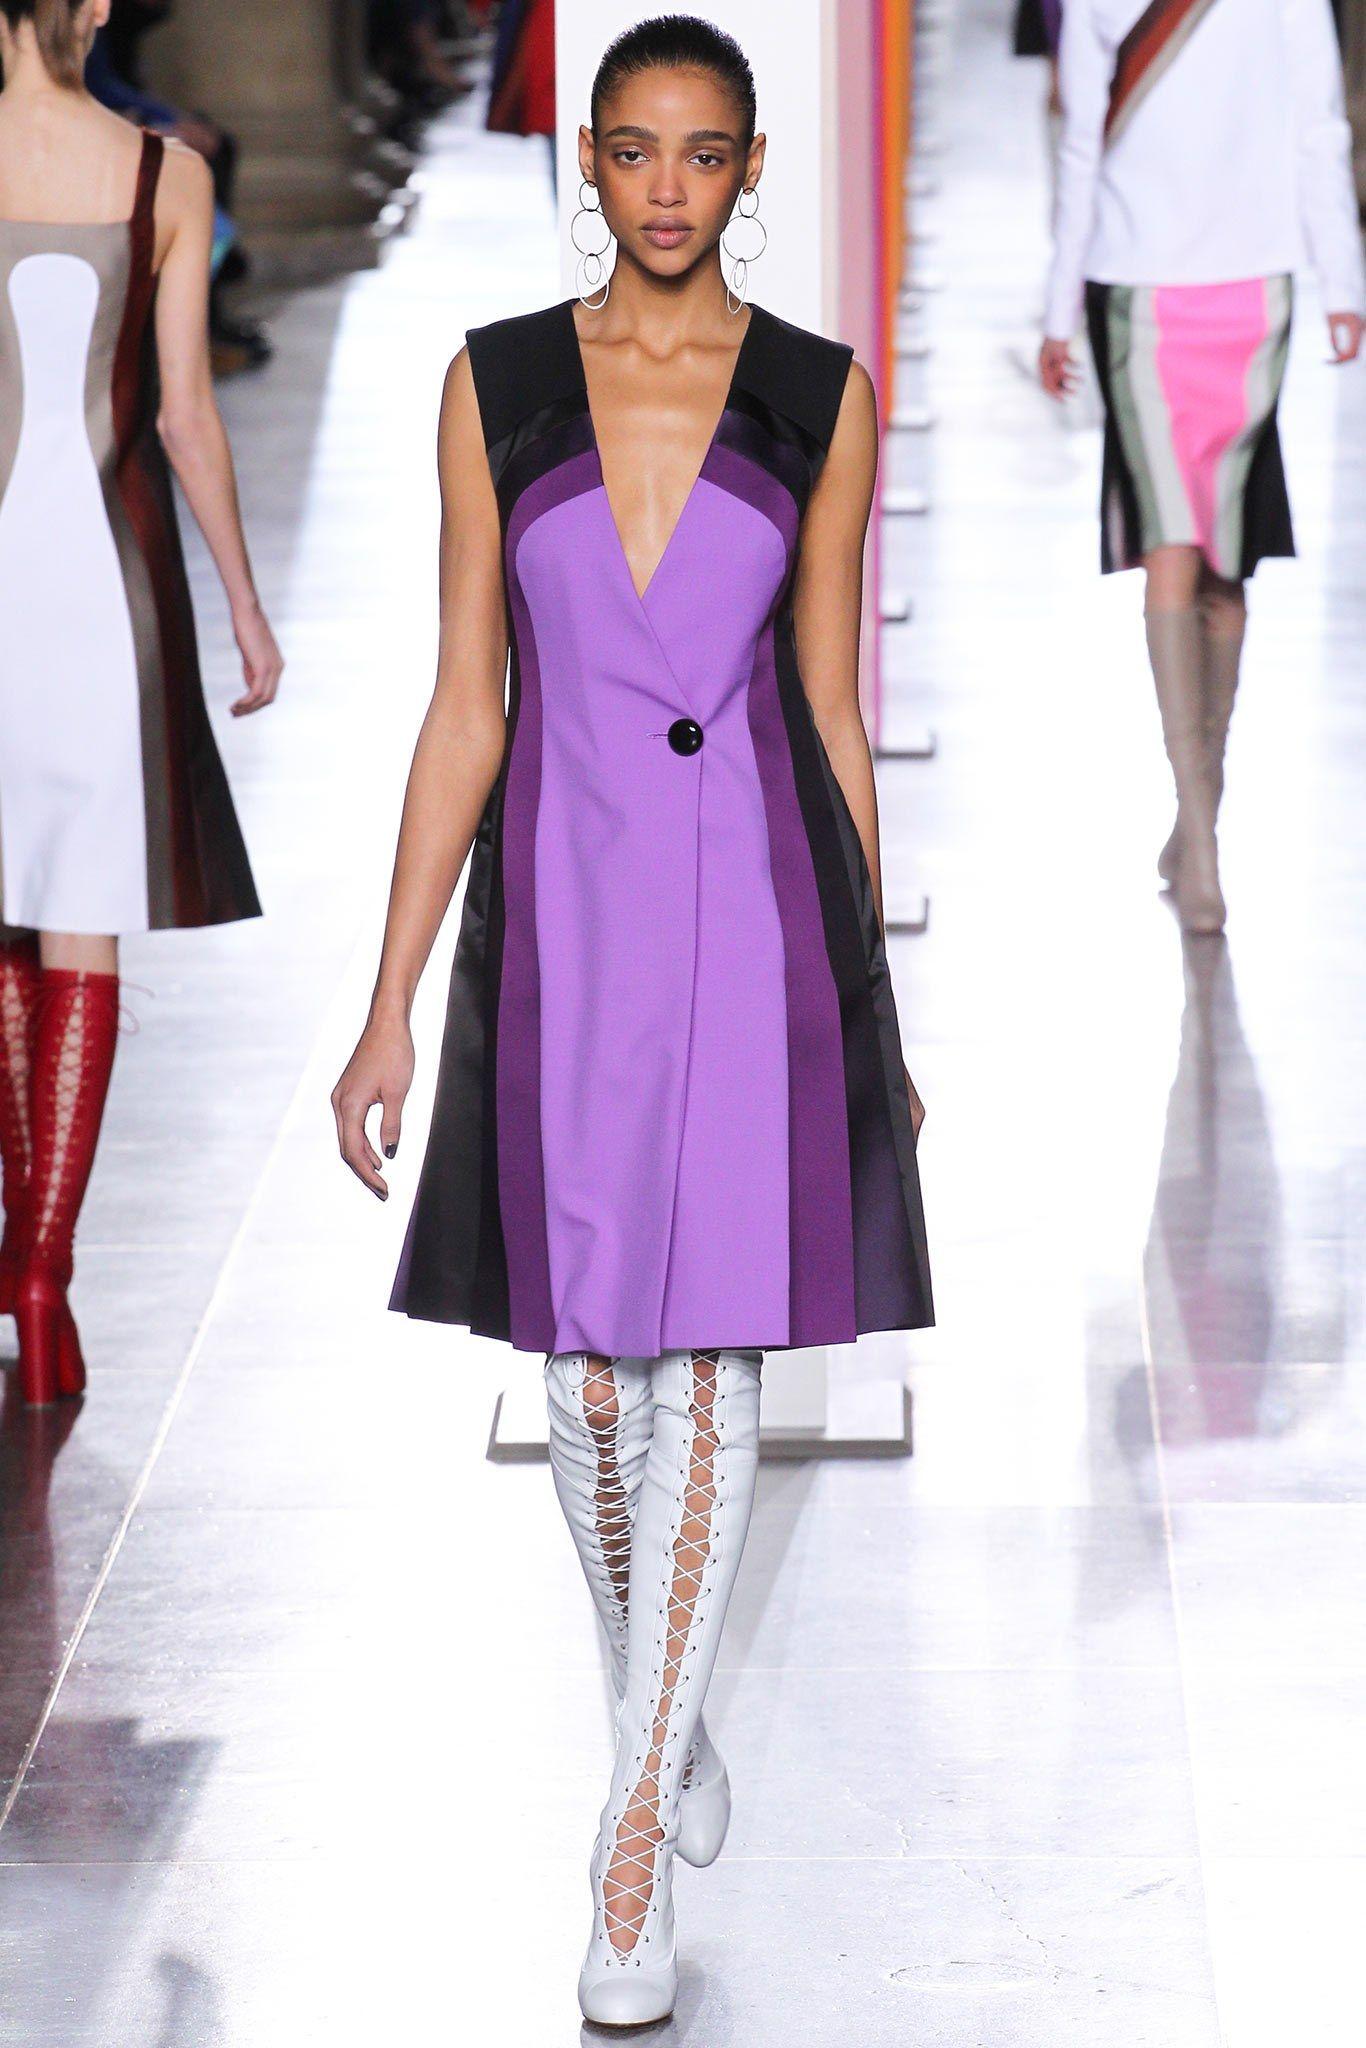 Model: Aya Jones